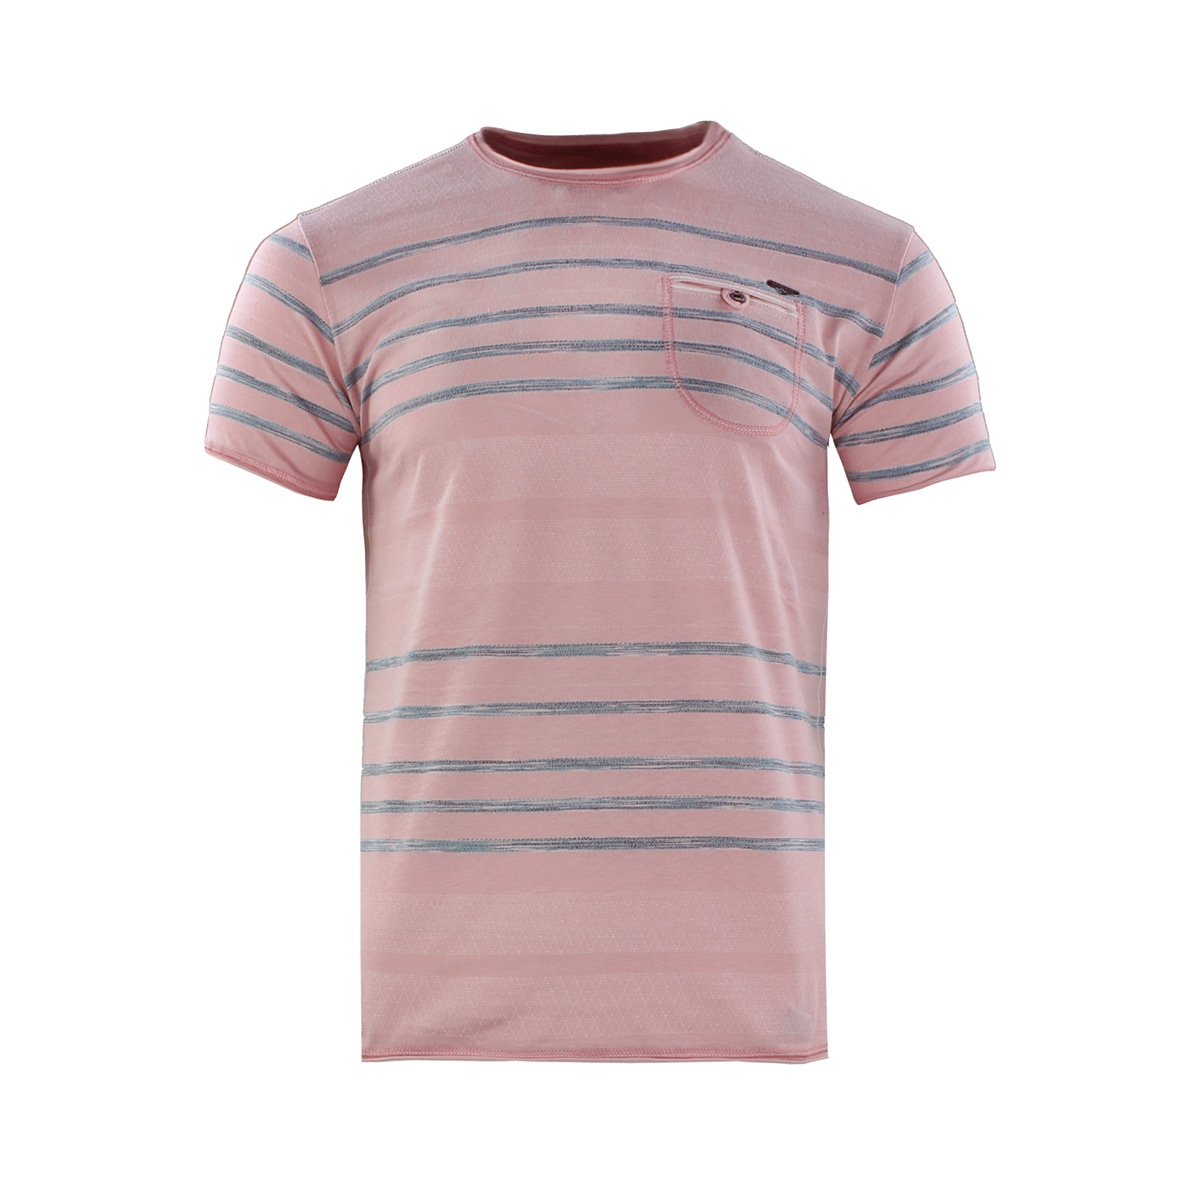 t shirt 15185 gabbiano t-shirt pink